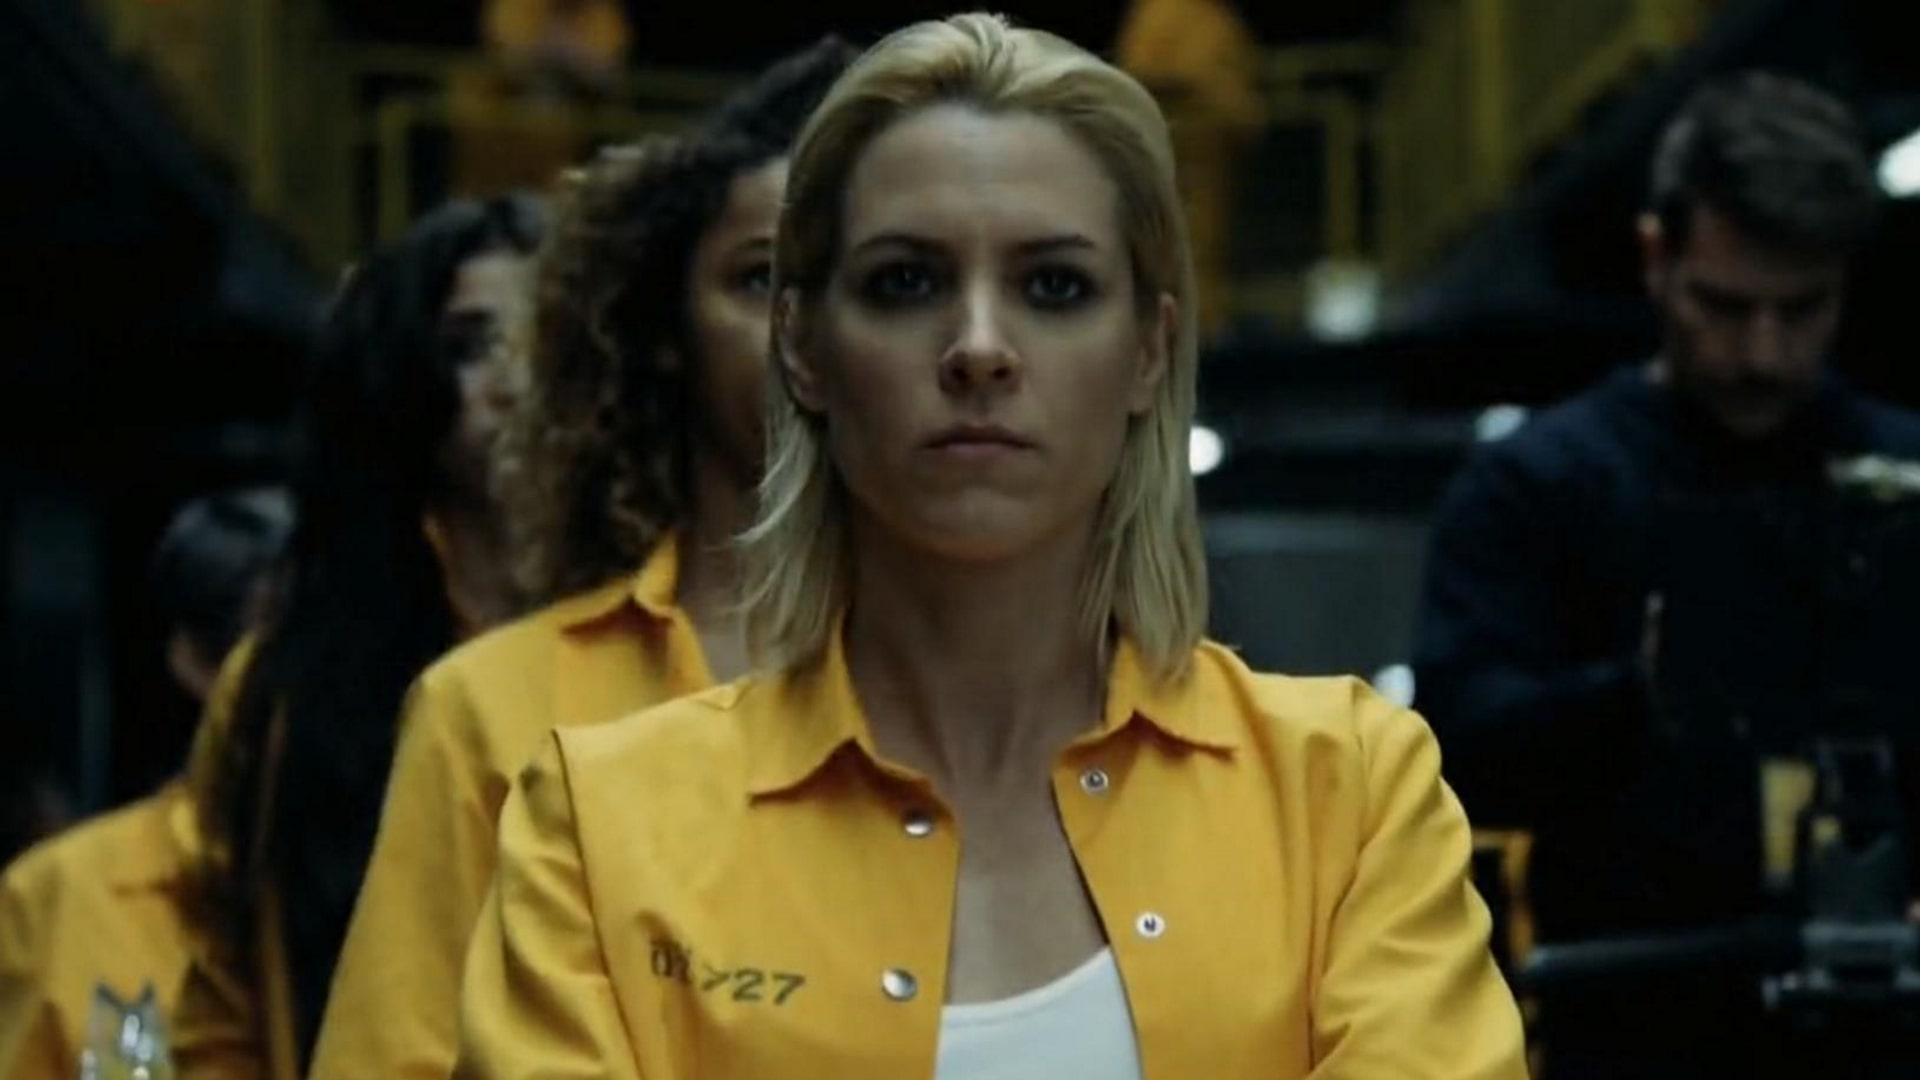 Locked Up (Vis A Vis) - Season 3 [Sub: Eng] - Best Movies